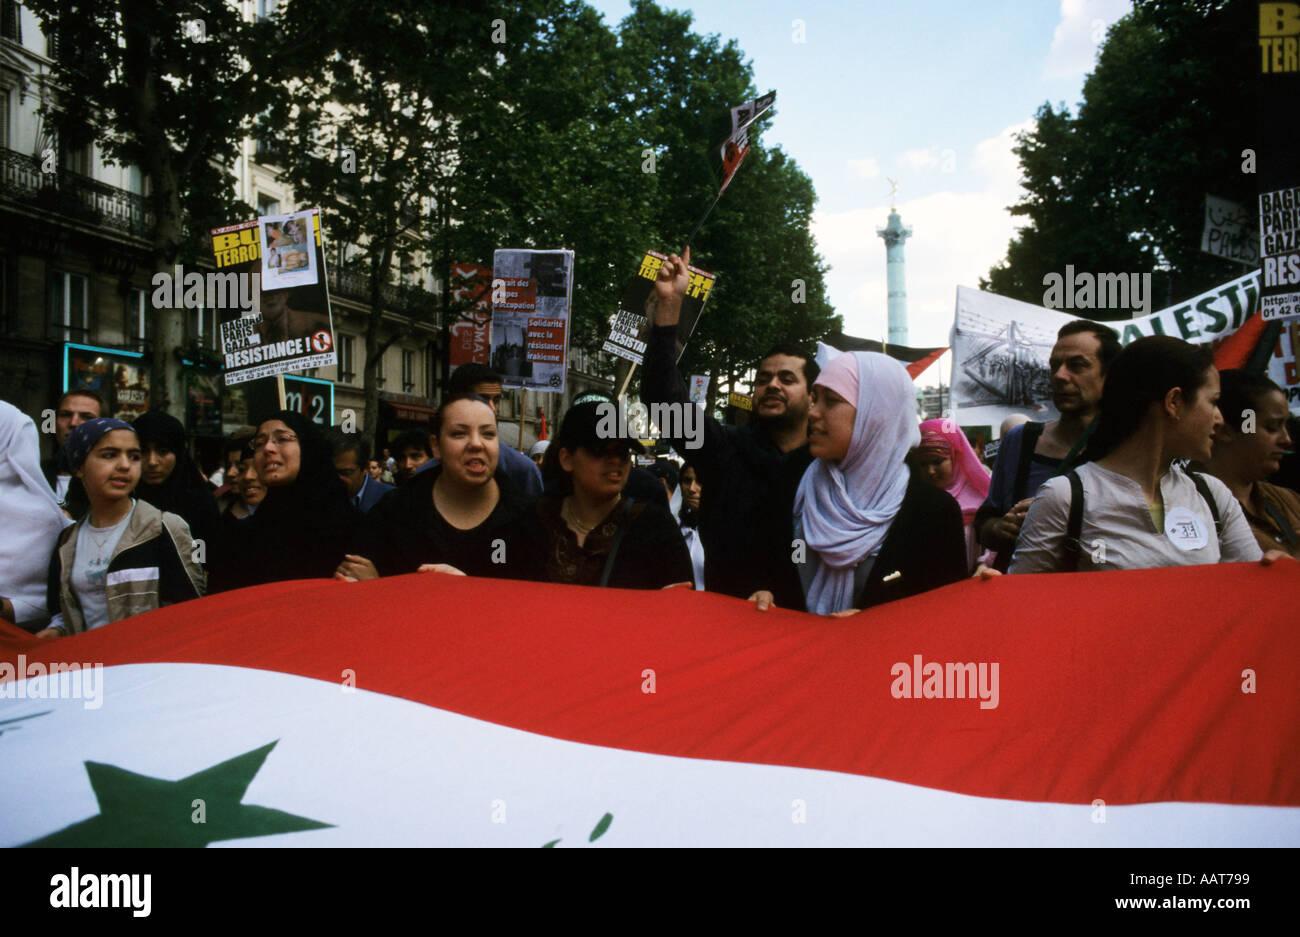 Protest Stop Israel s war on Palestine Paris France - Stock Image